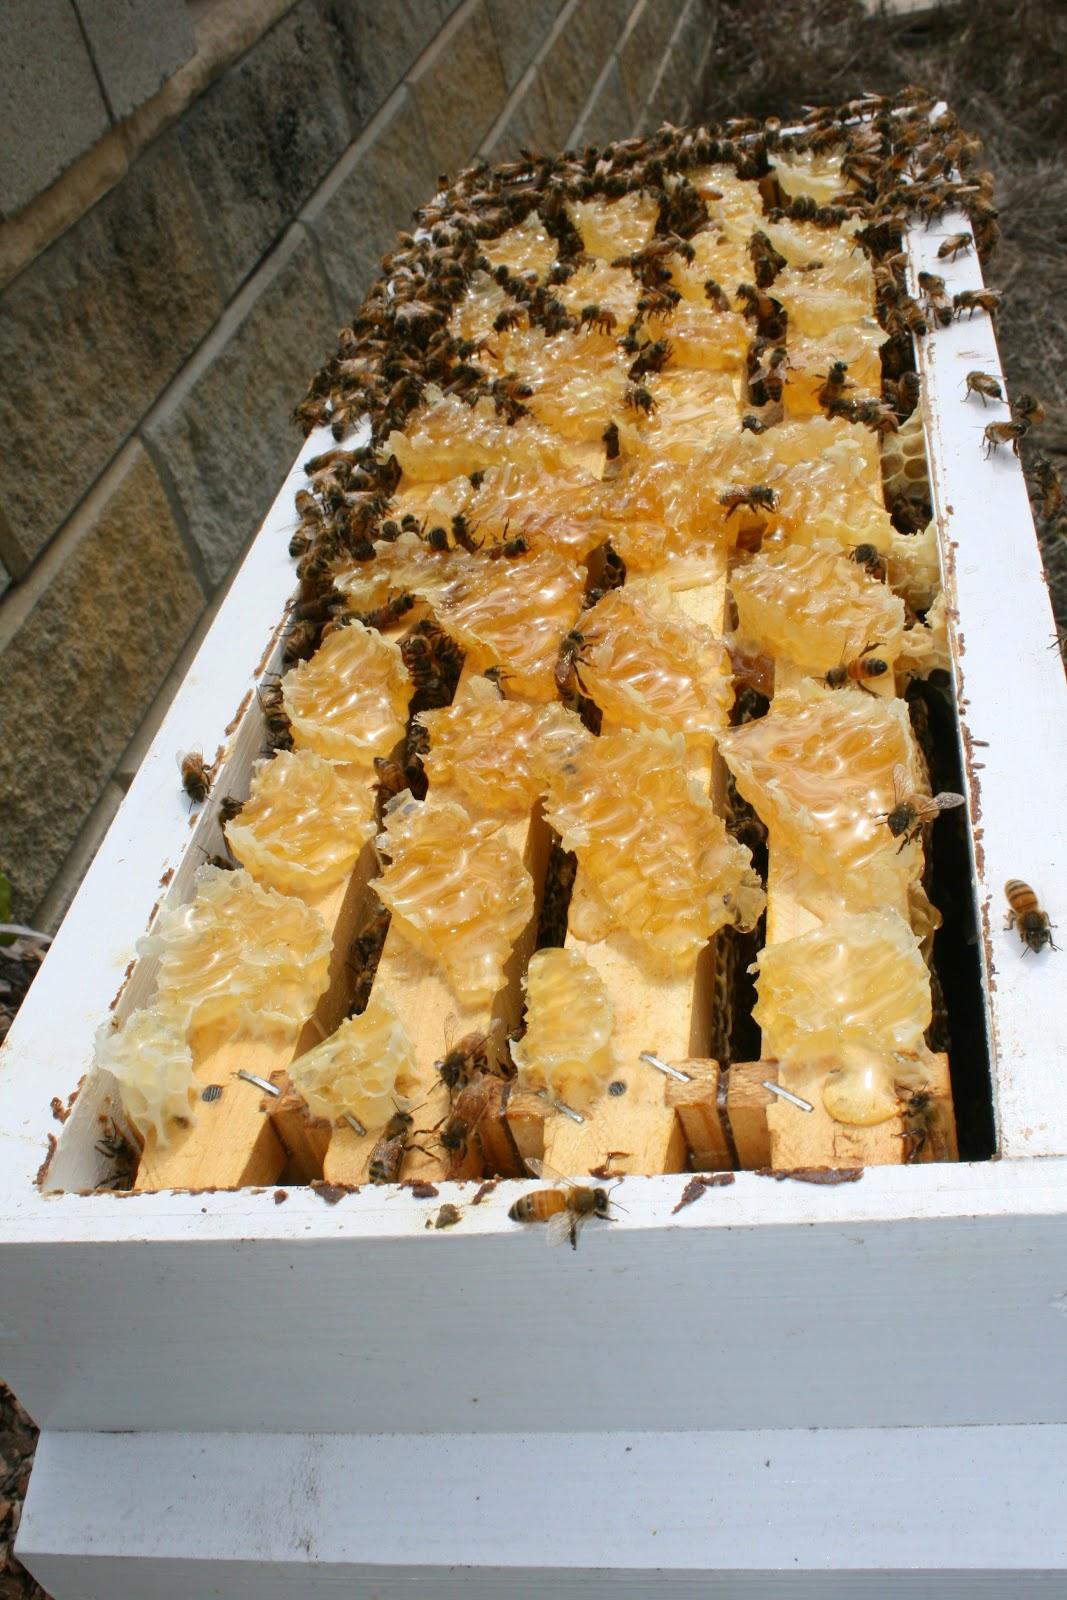 Productive Beehive burr comb